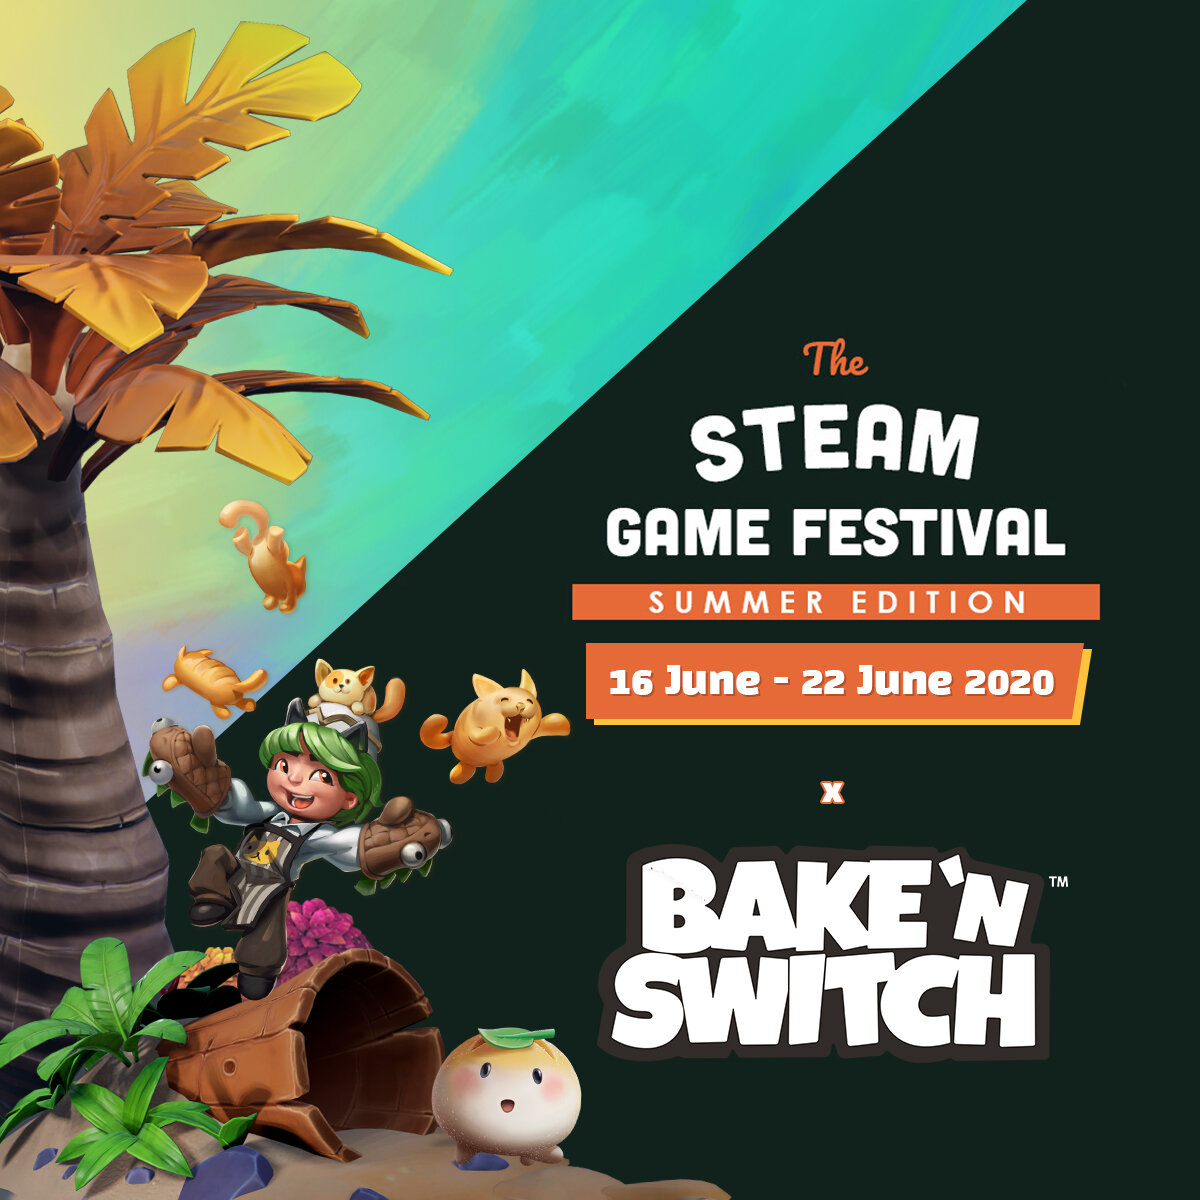 Steam Game Festival x Bake 'n Switch